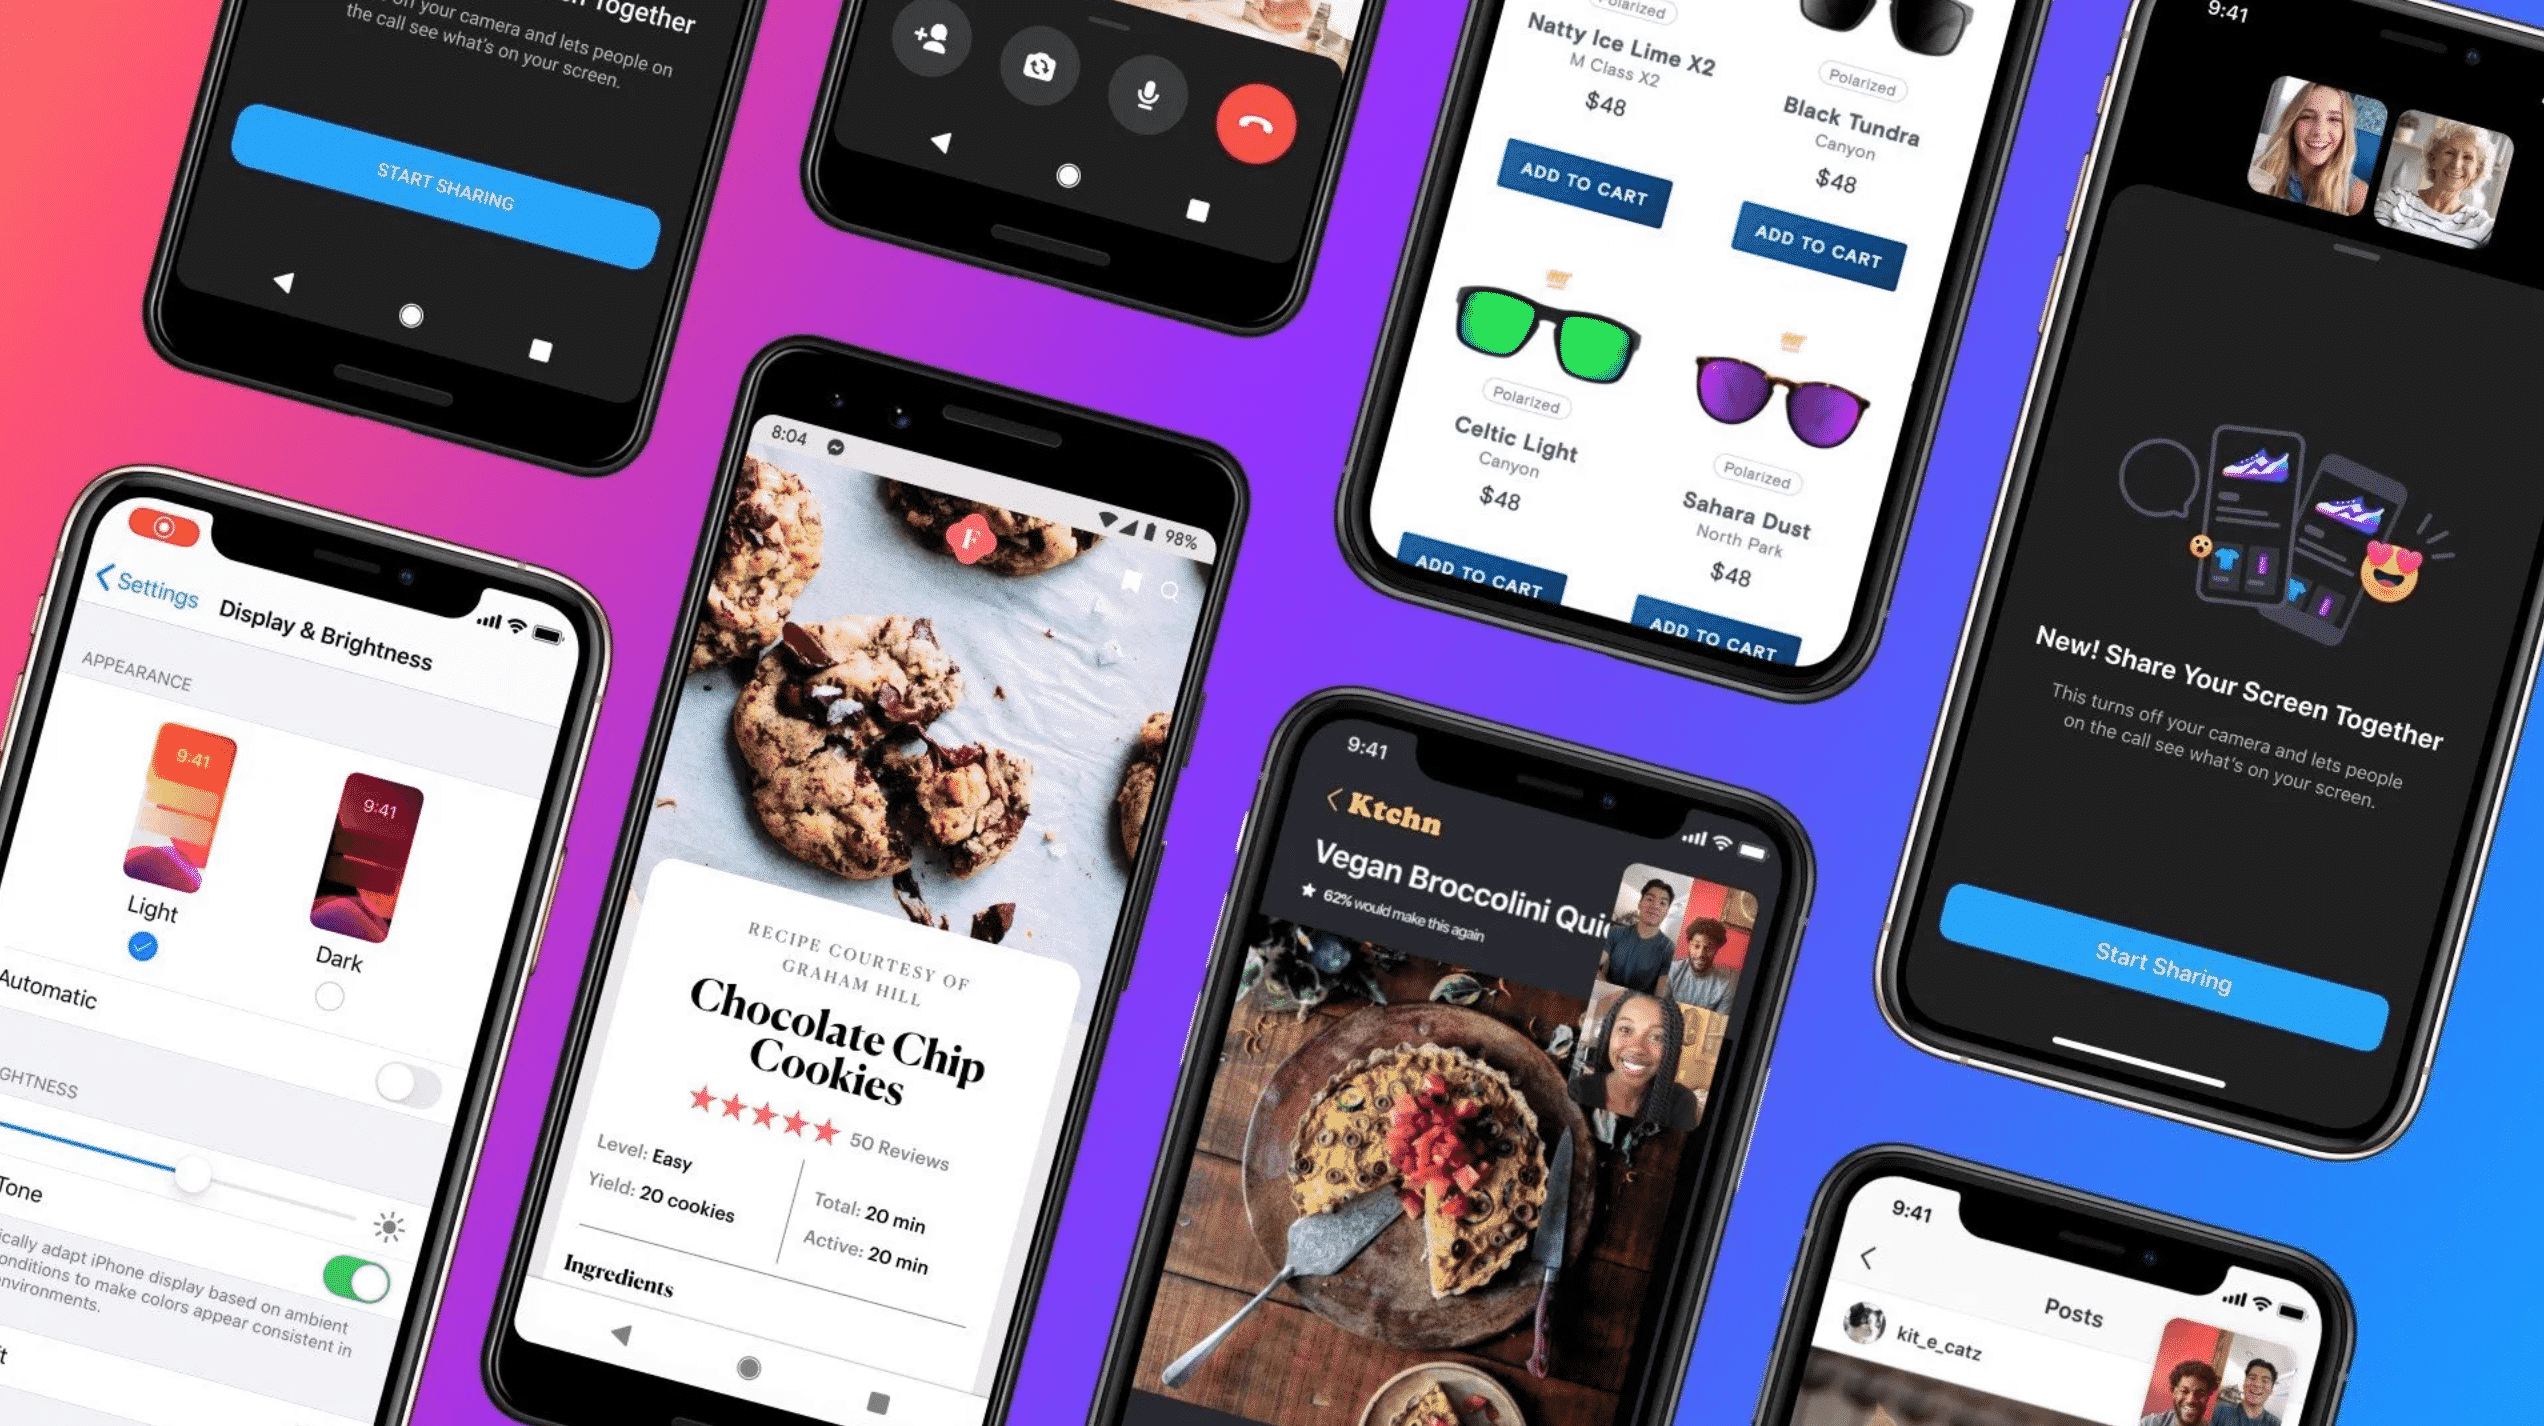 Messenger on iOS